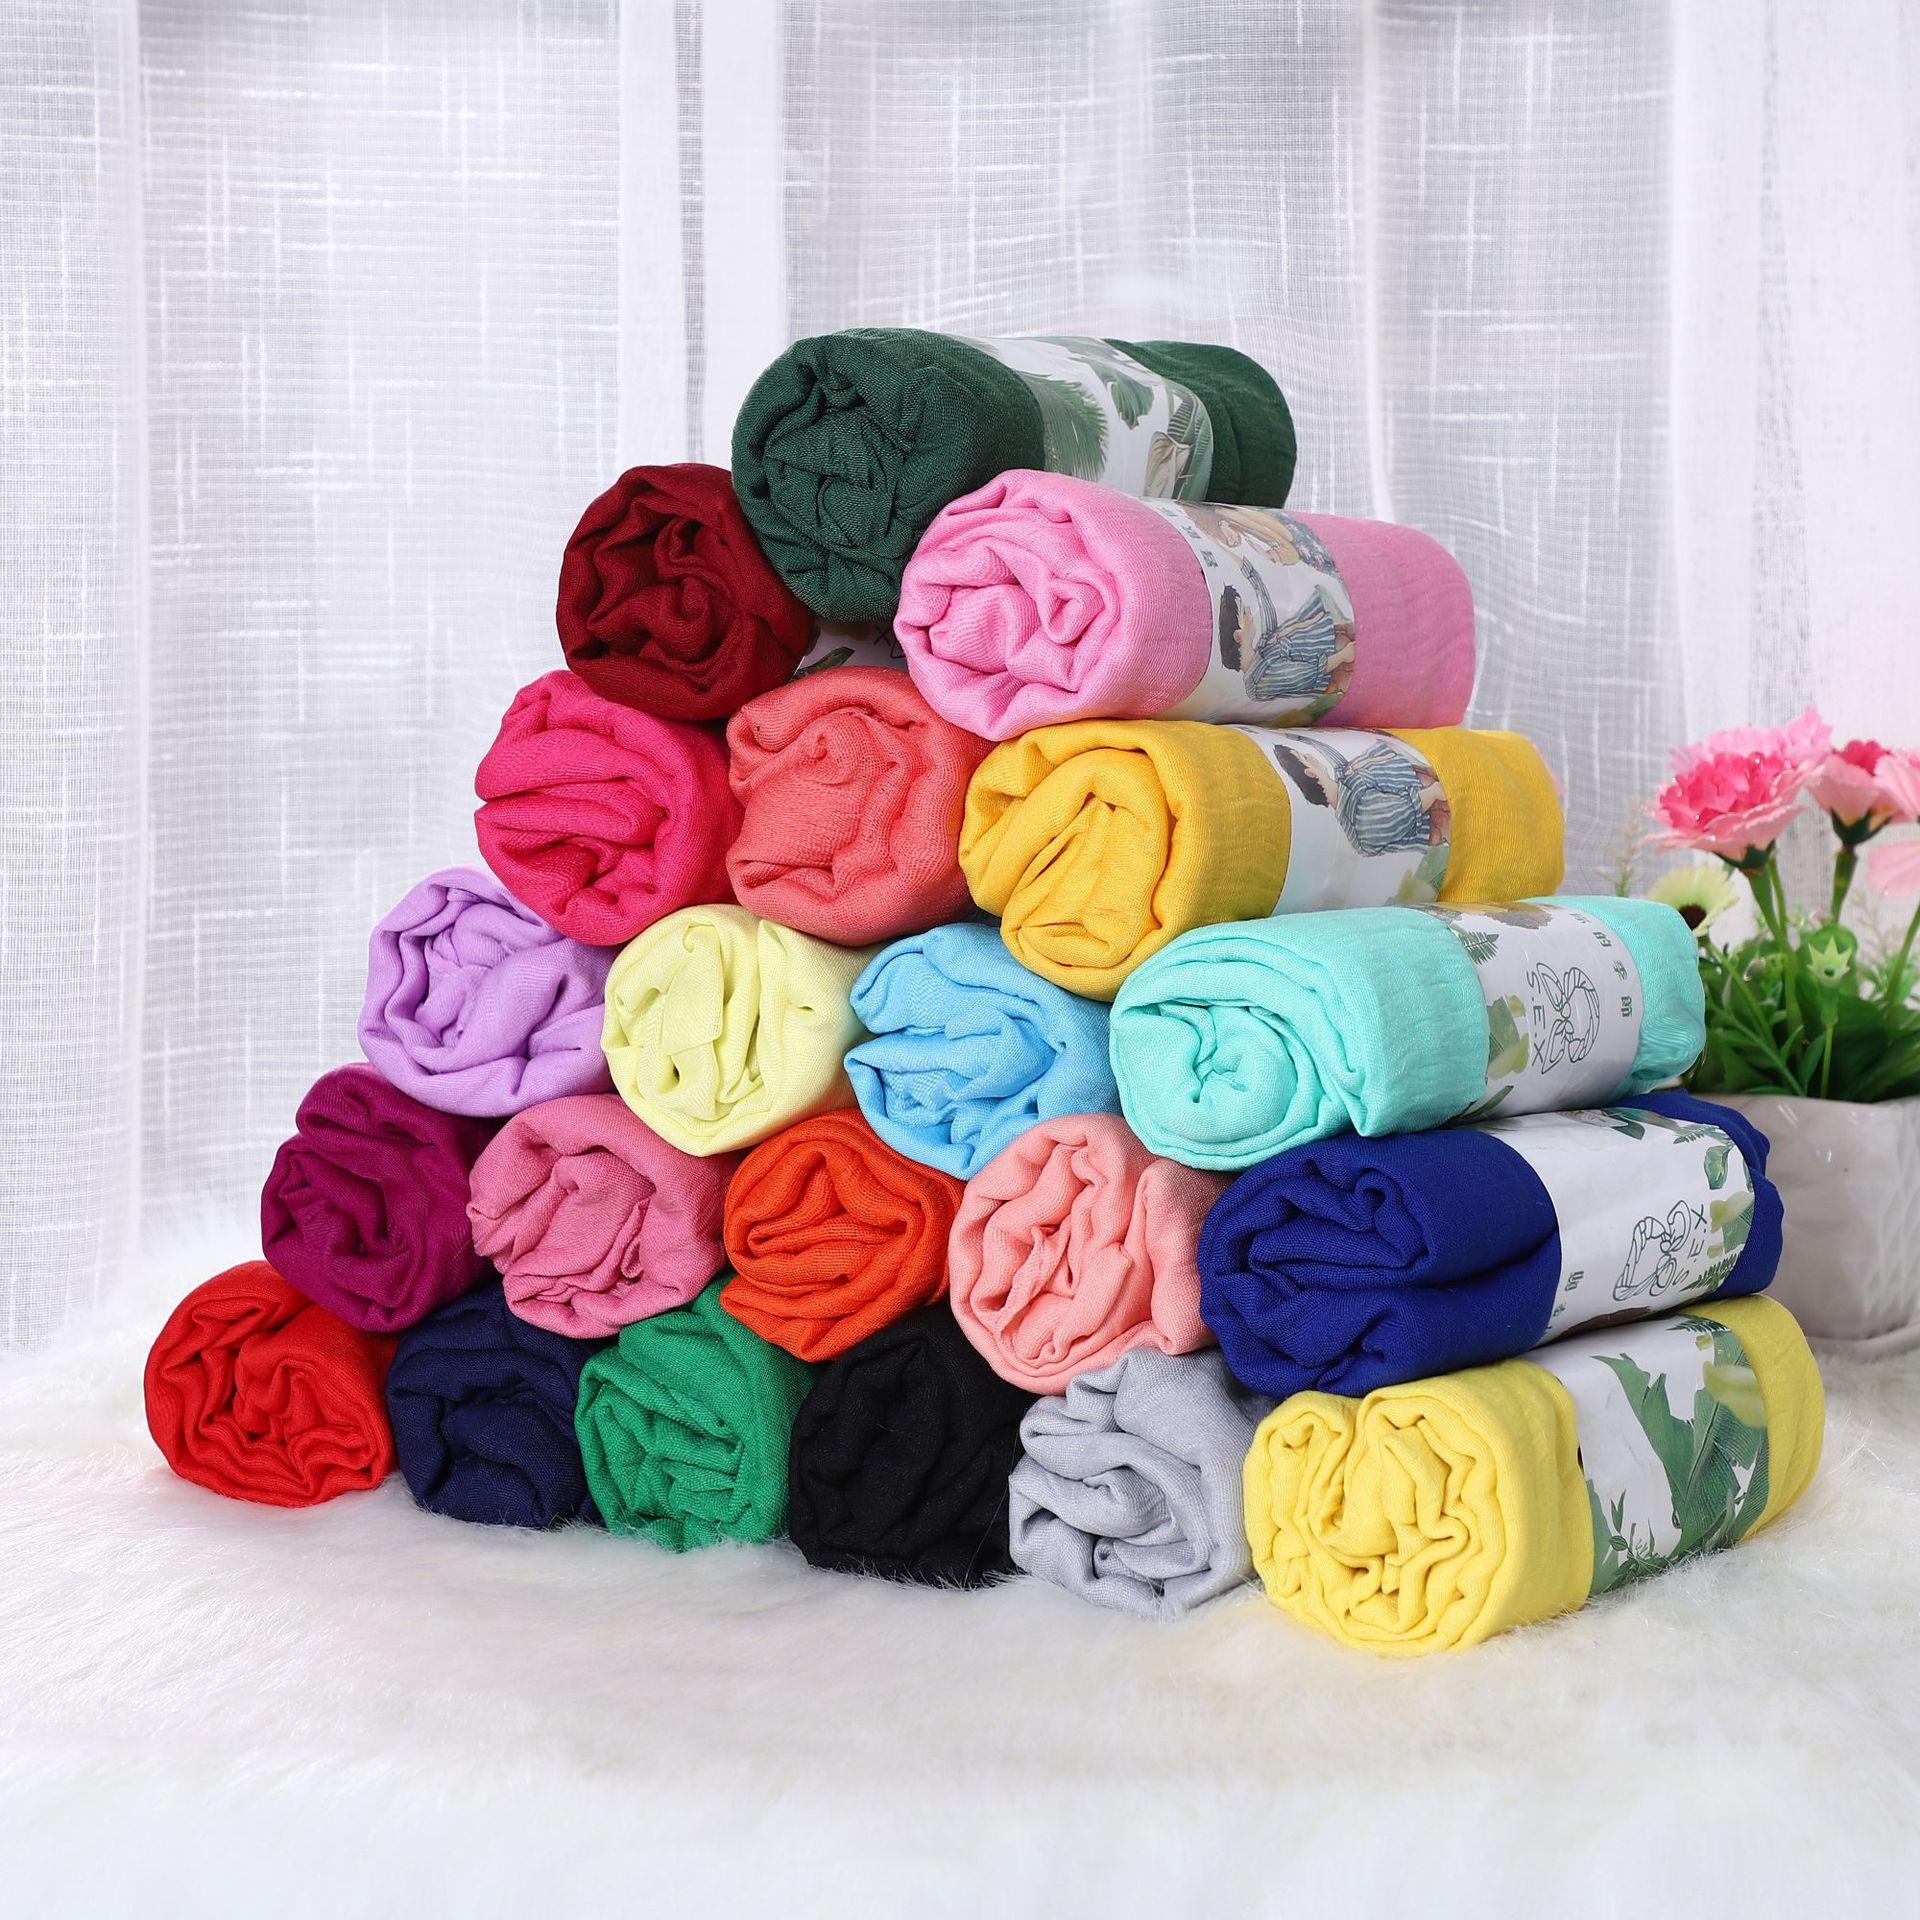 50 X 180cm Muslim  Scarf Shawl And Wrap Cotton Crinkled Hijab Solid Large Size Islam Foulard Turban For Women Headscarf